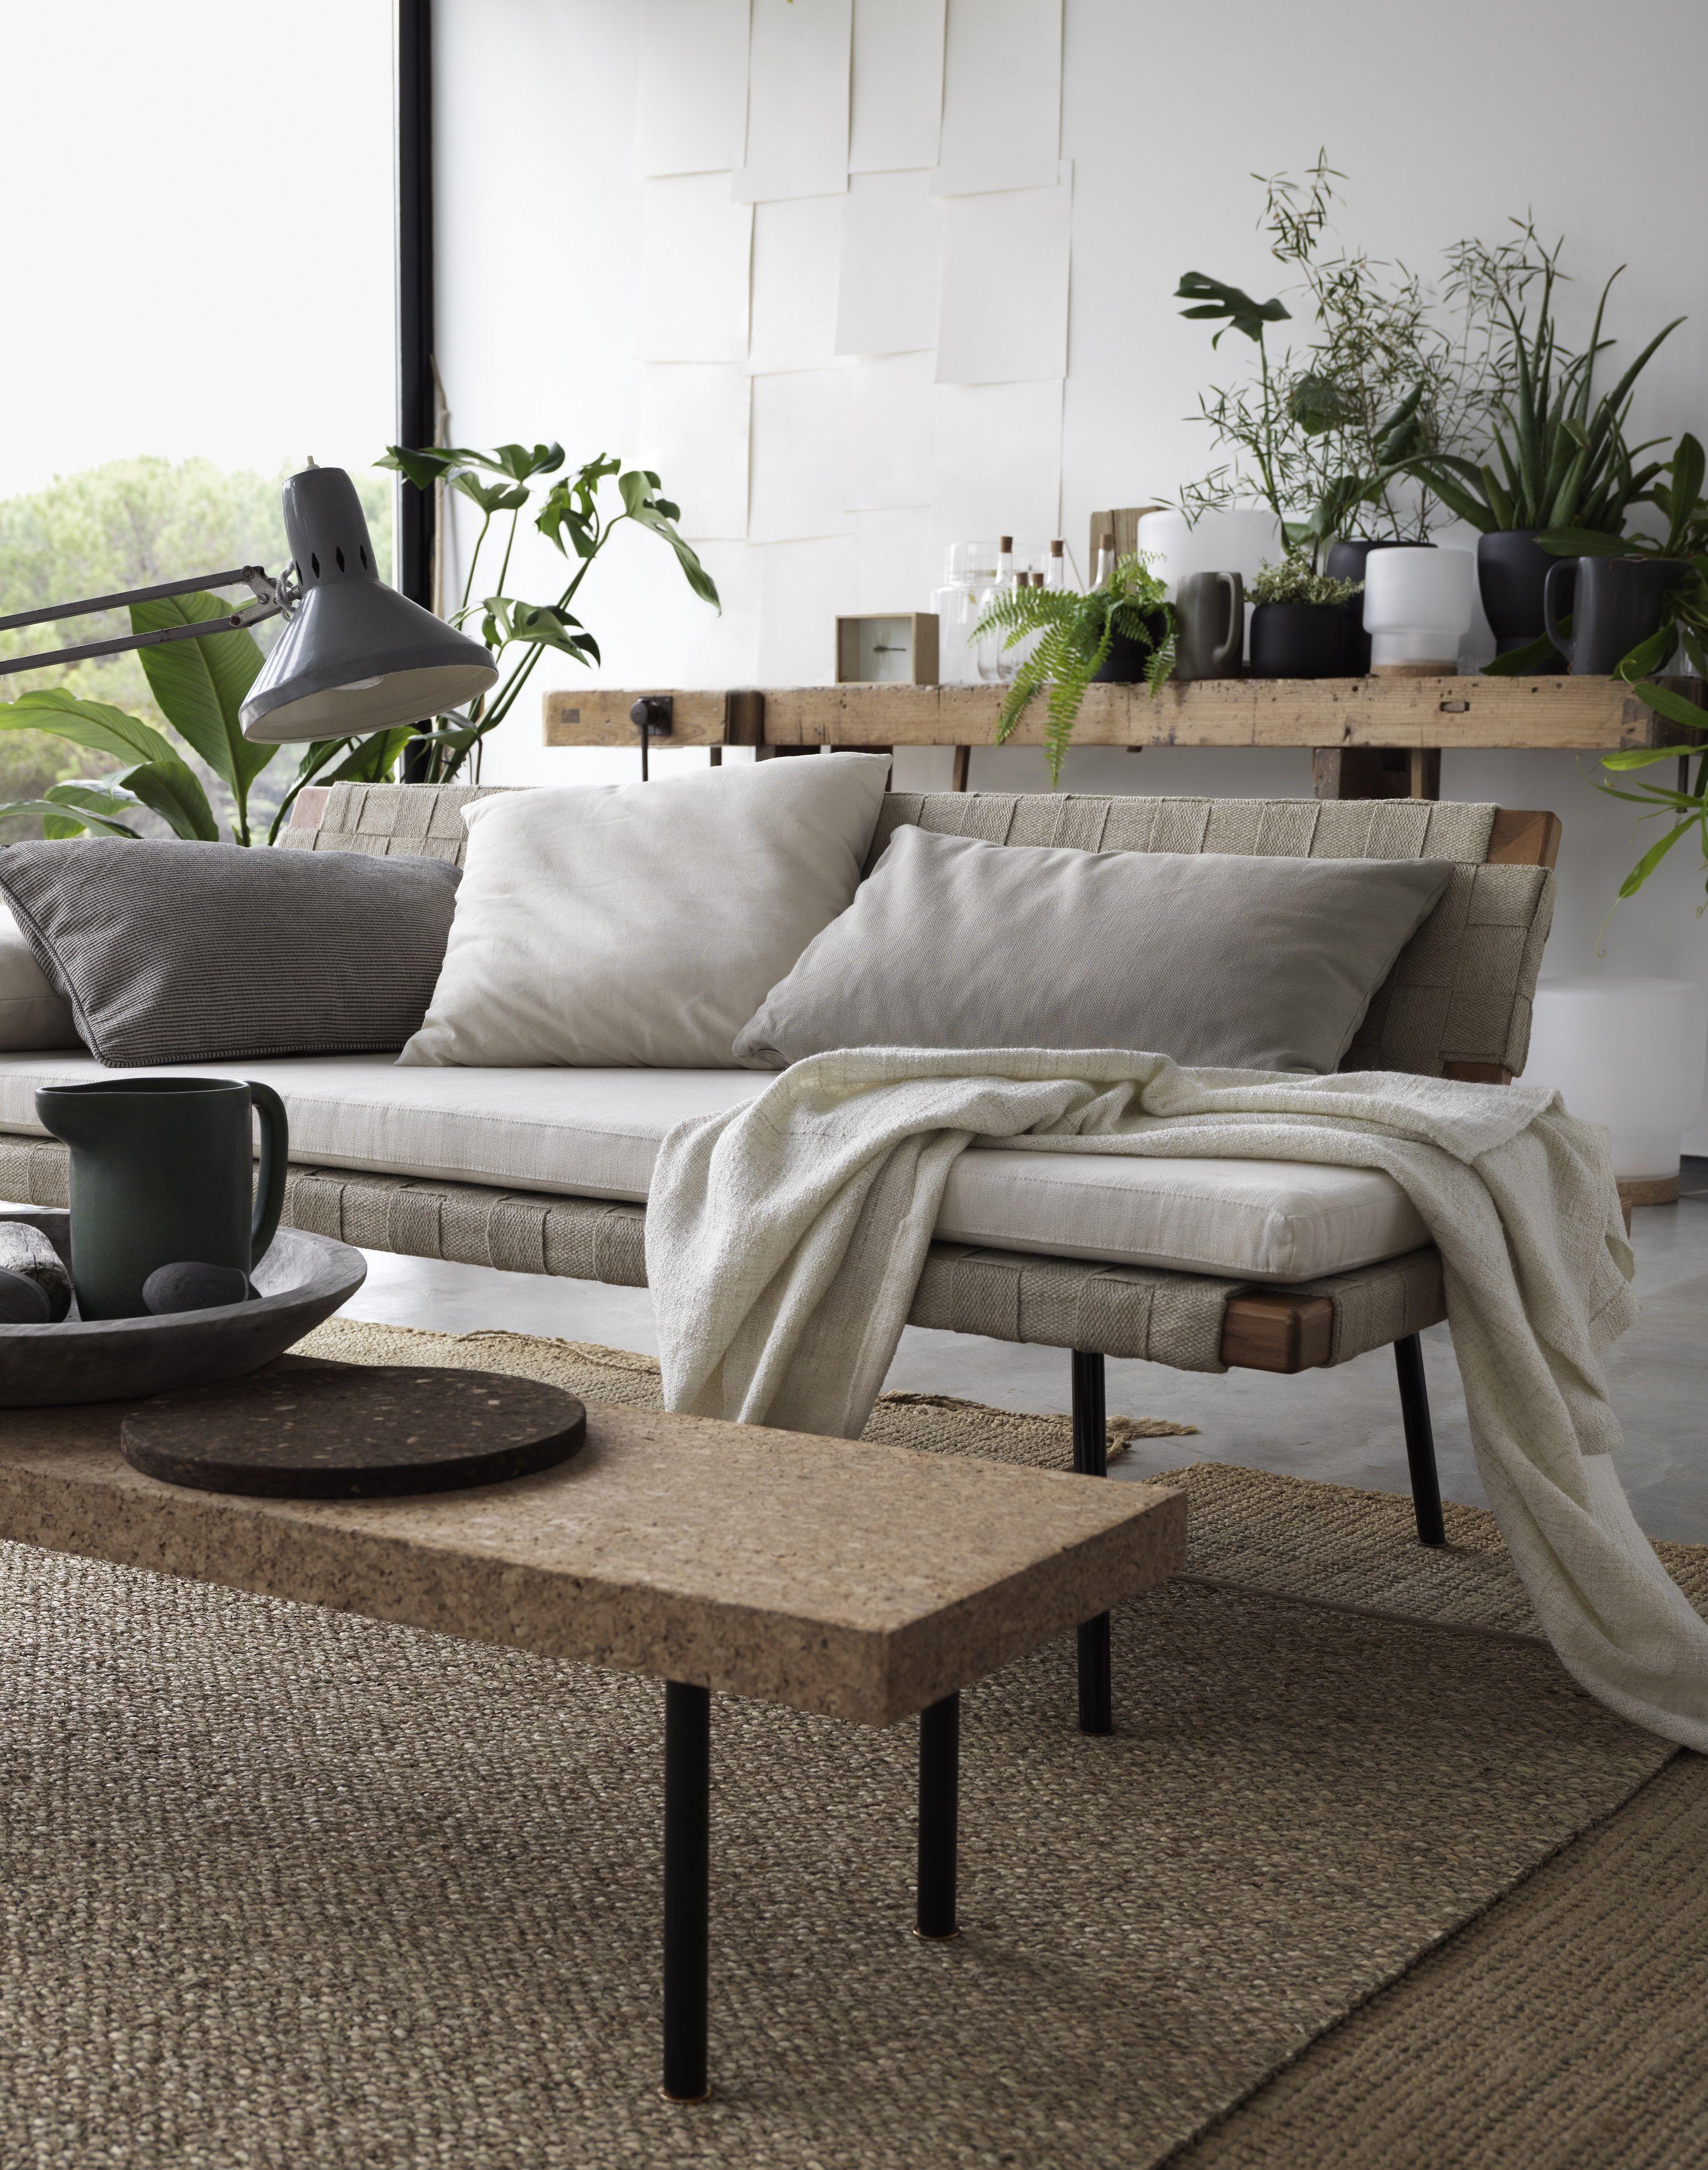 220ded8f9a1ab797f8f18cde341b5886 Impressionnant De Table Gigogne Ikea Concept